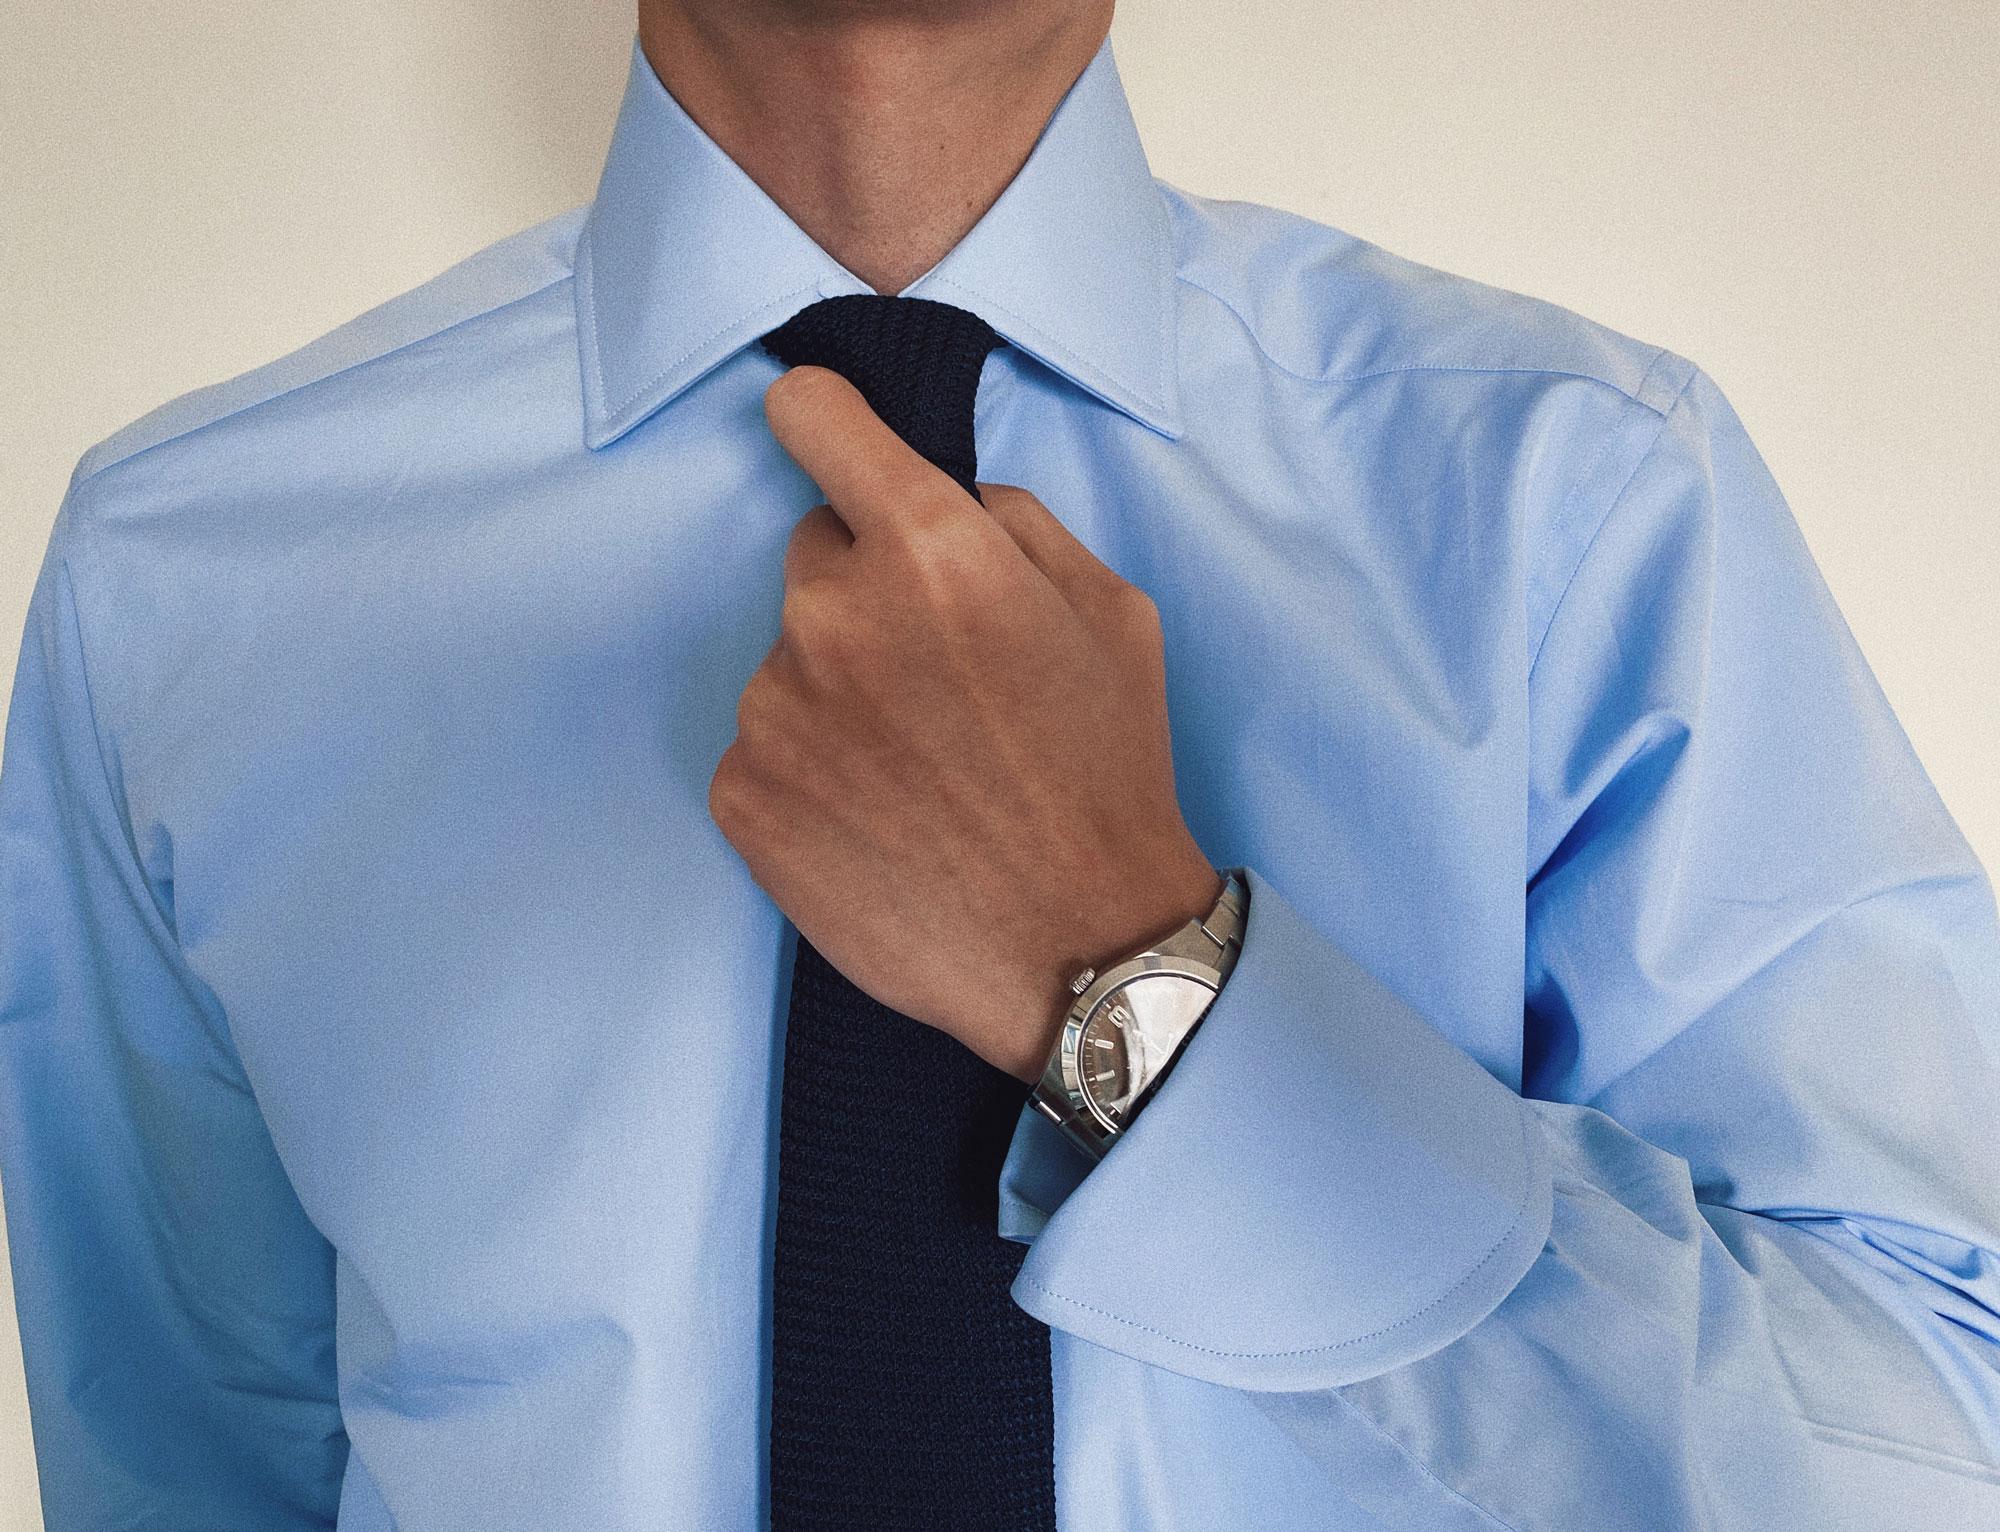 Dr. No Cocktail Cuffs Turnbull & Asser shirt